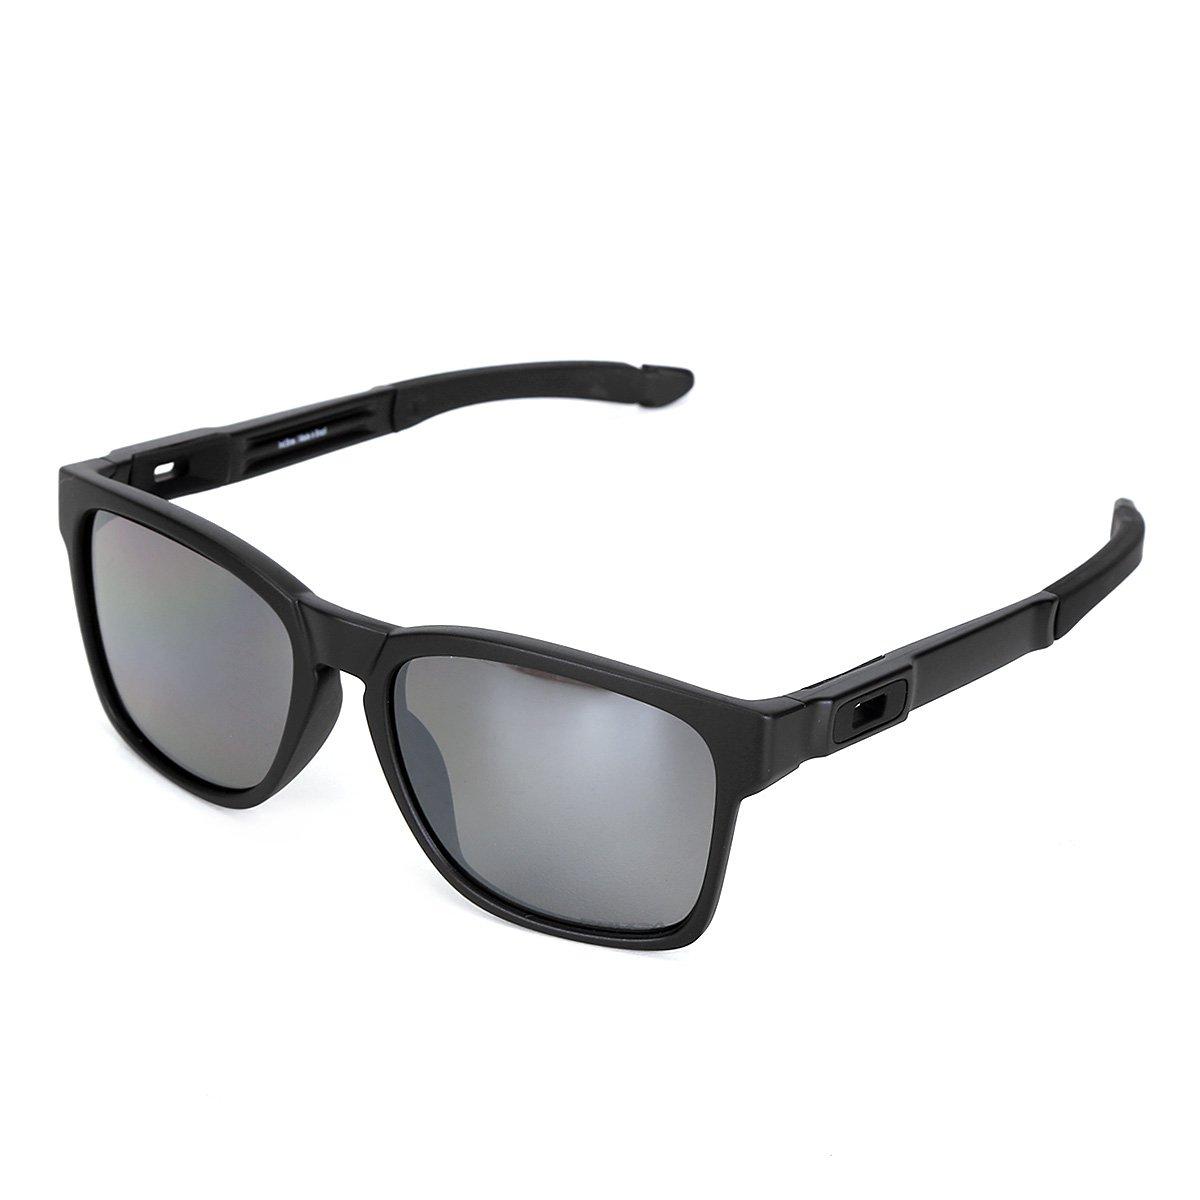 1803d8214 Óculos de Sol Oakley Catalyst Polarized Masculino   Livelo -Sua Vida ...